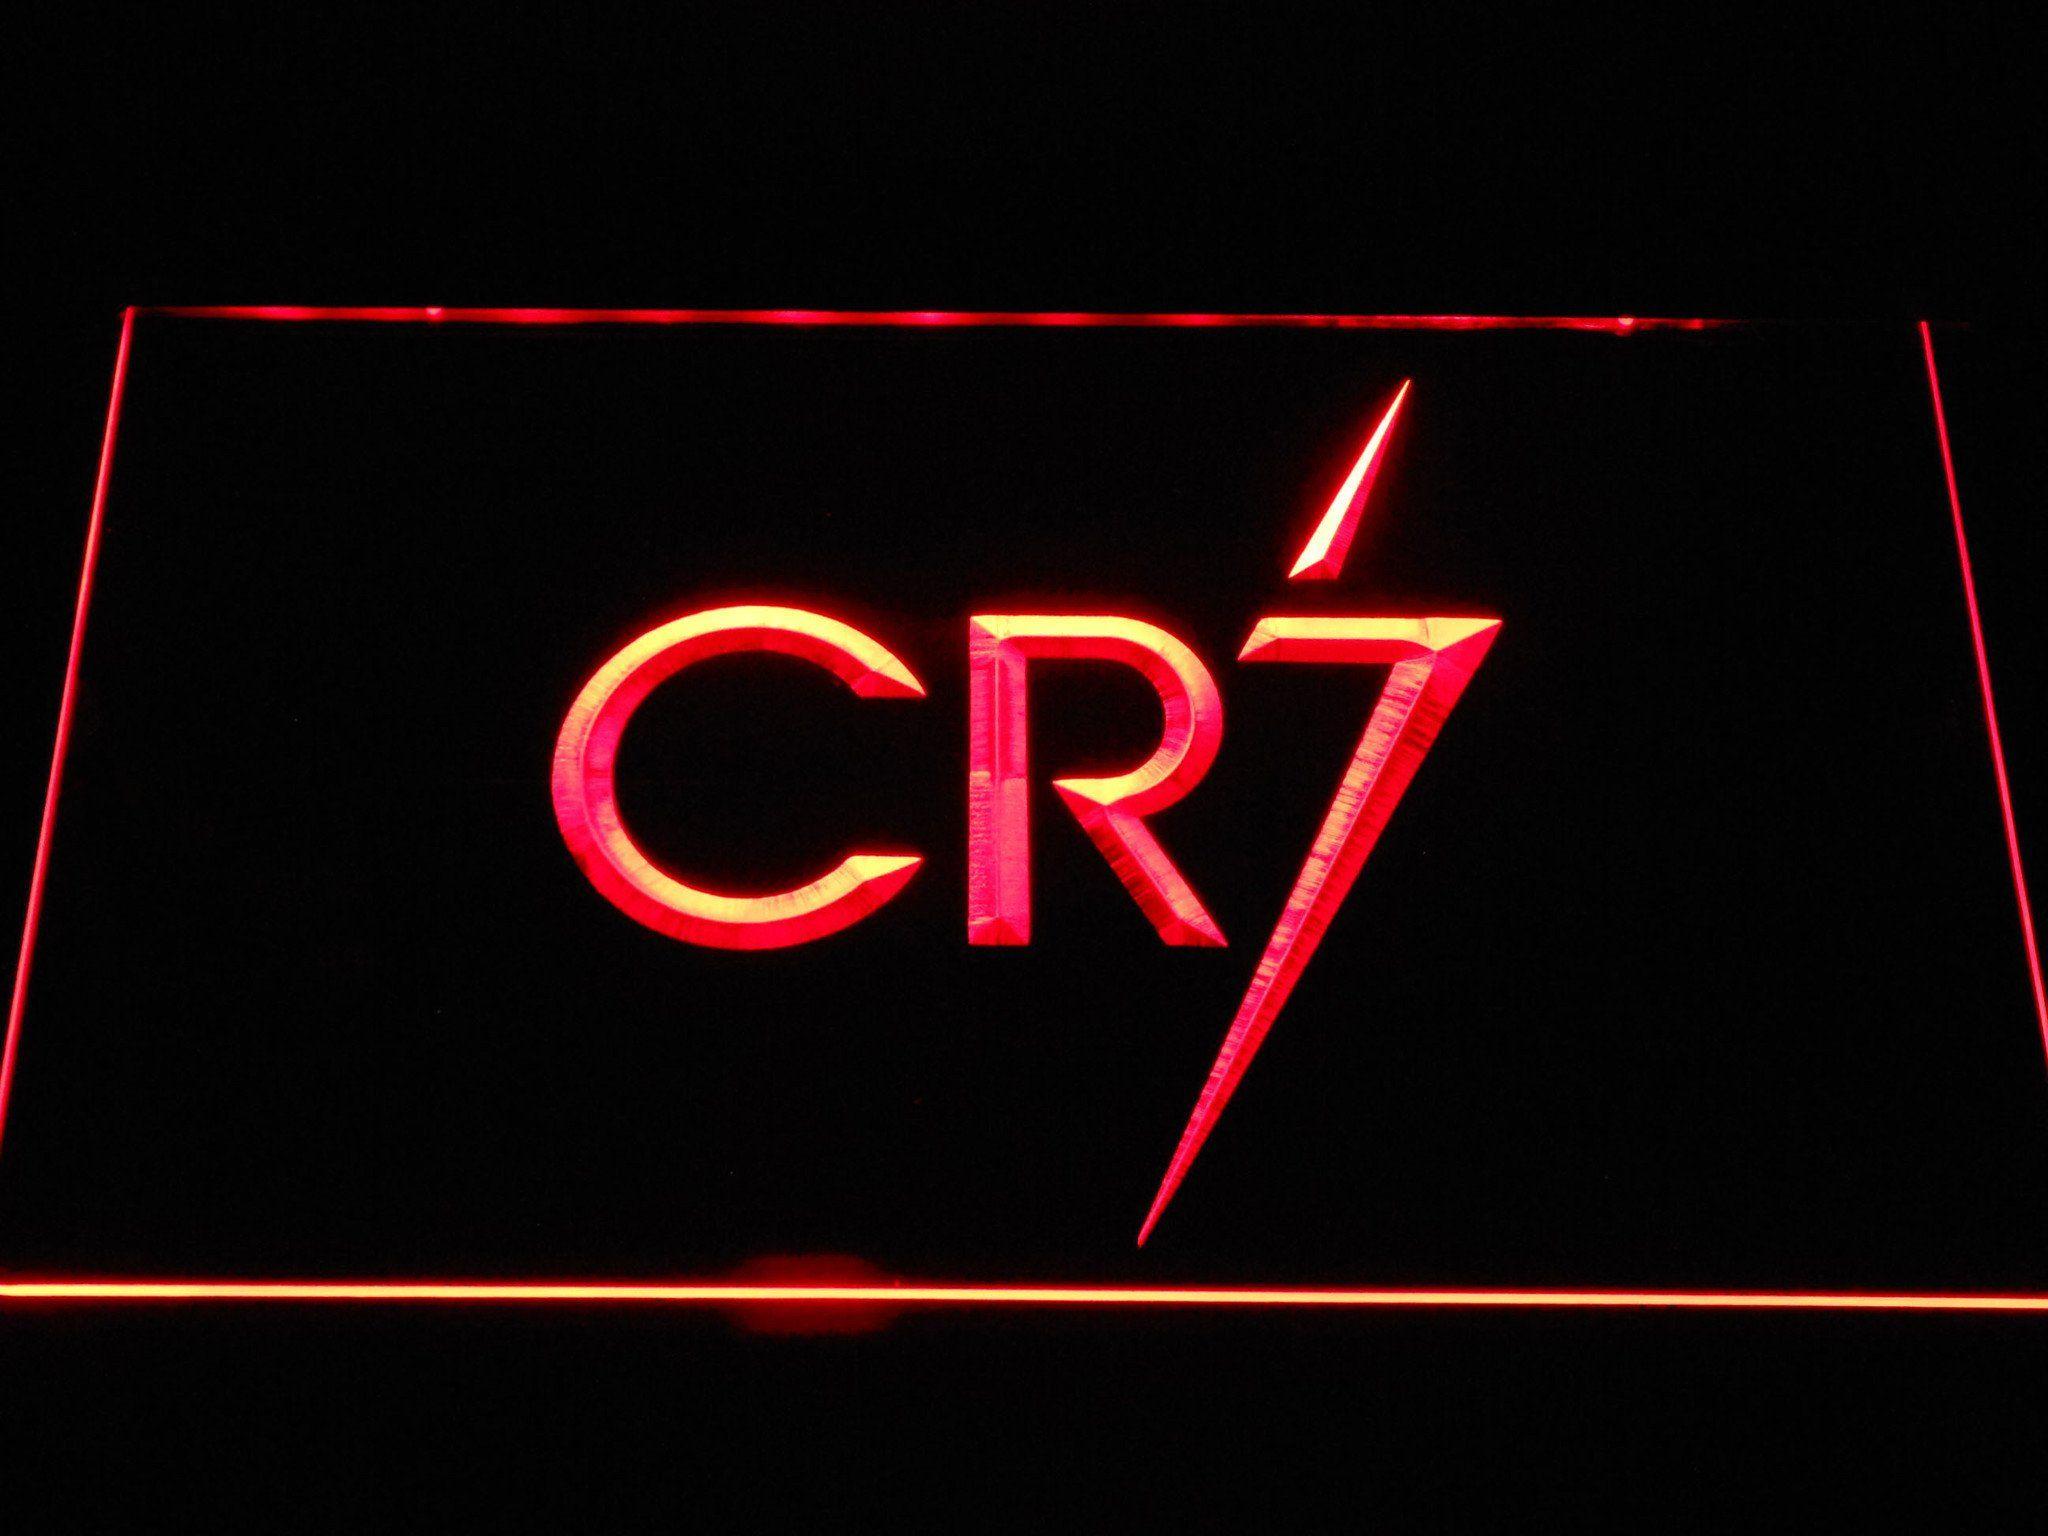 Real Madrid Cf Cristiano Ronaldo Cr7 Logo Led Neon Sign Neon Signs Led Neon Signs Cristiano Ronaldo Cr7